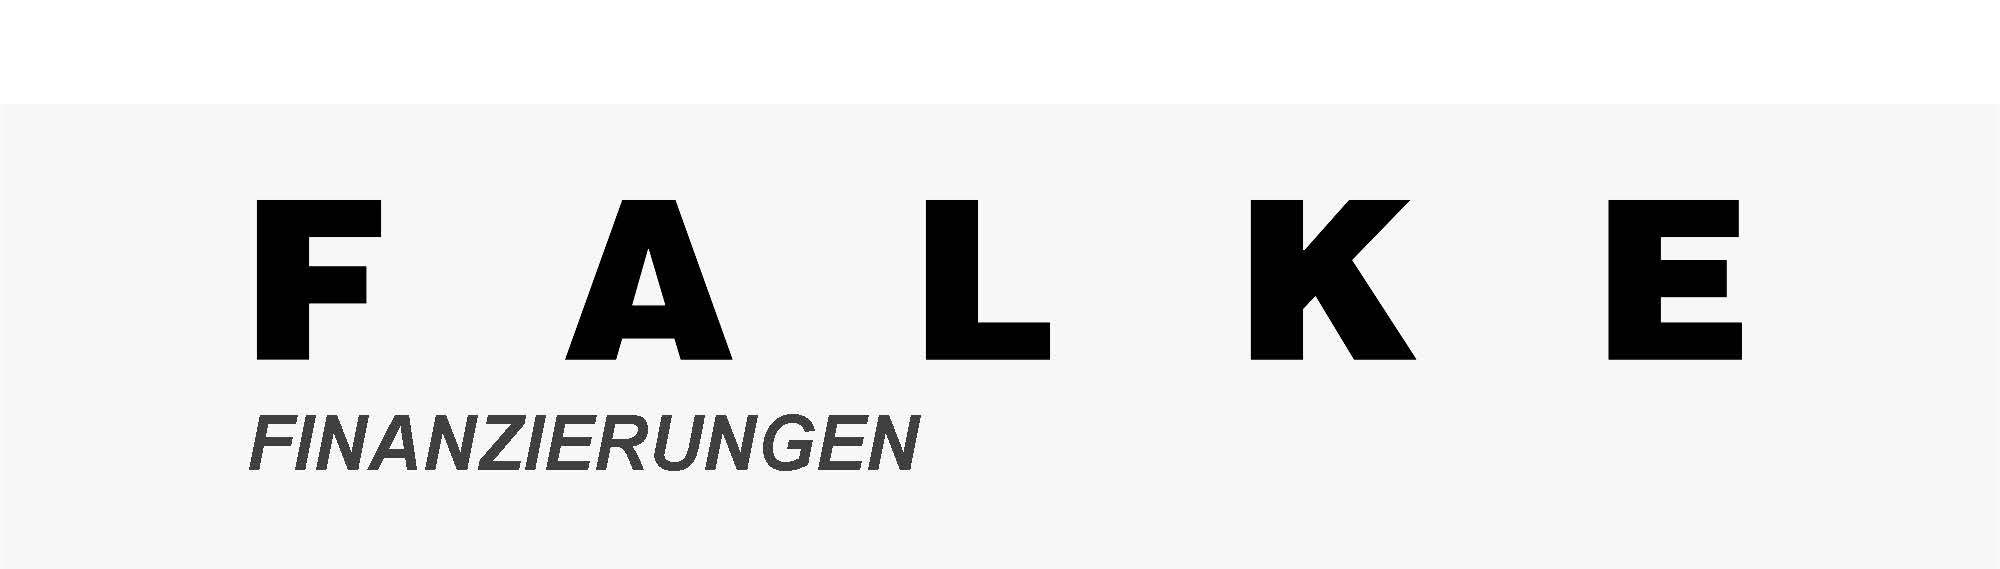 falke-makler.de-Logo